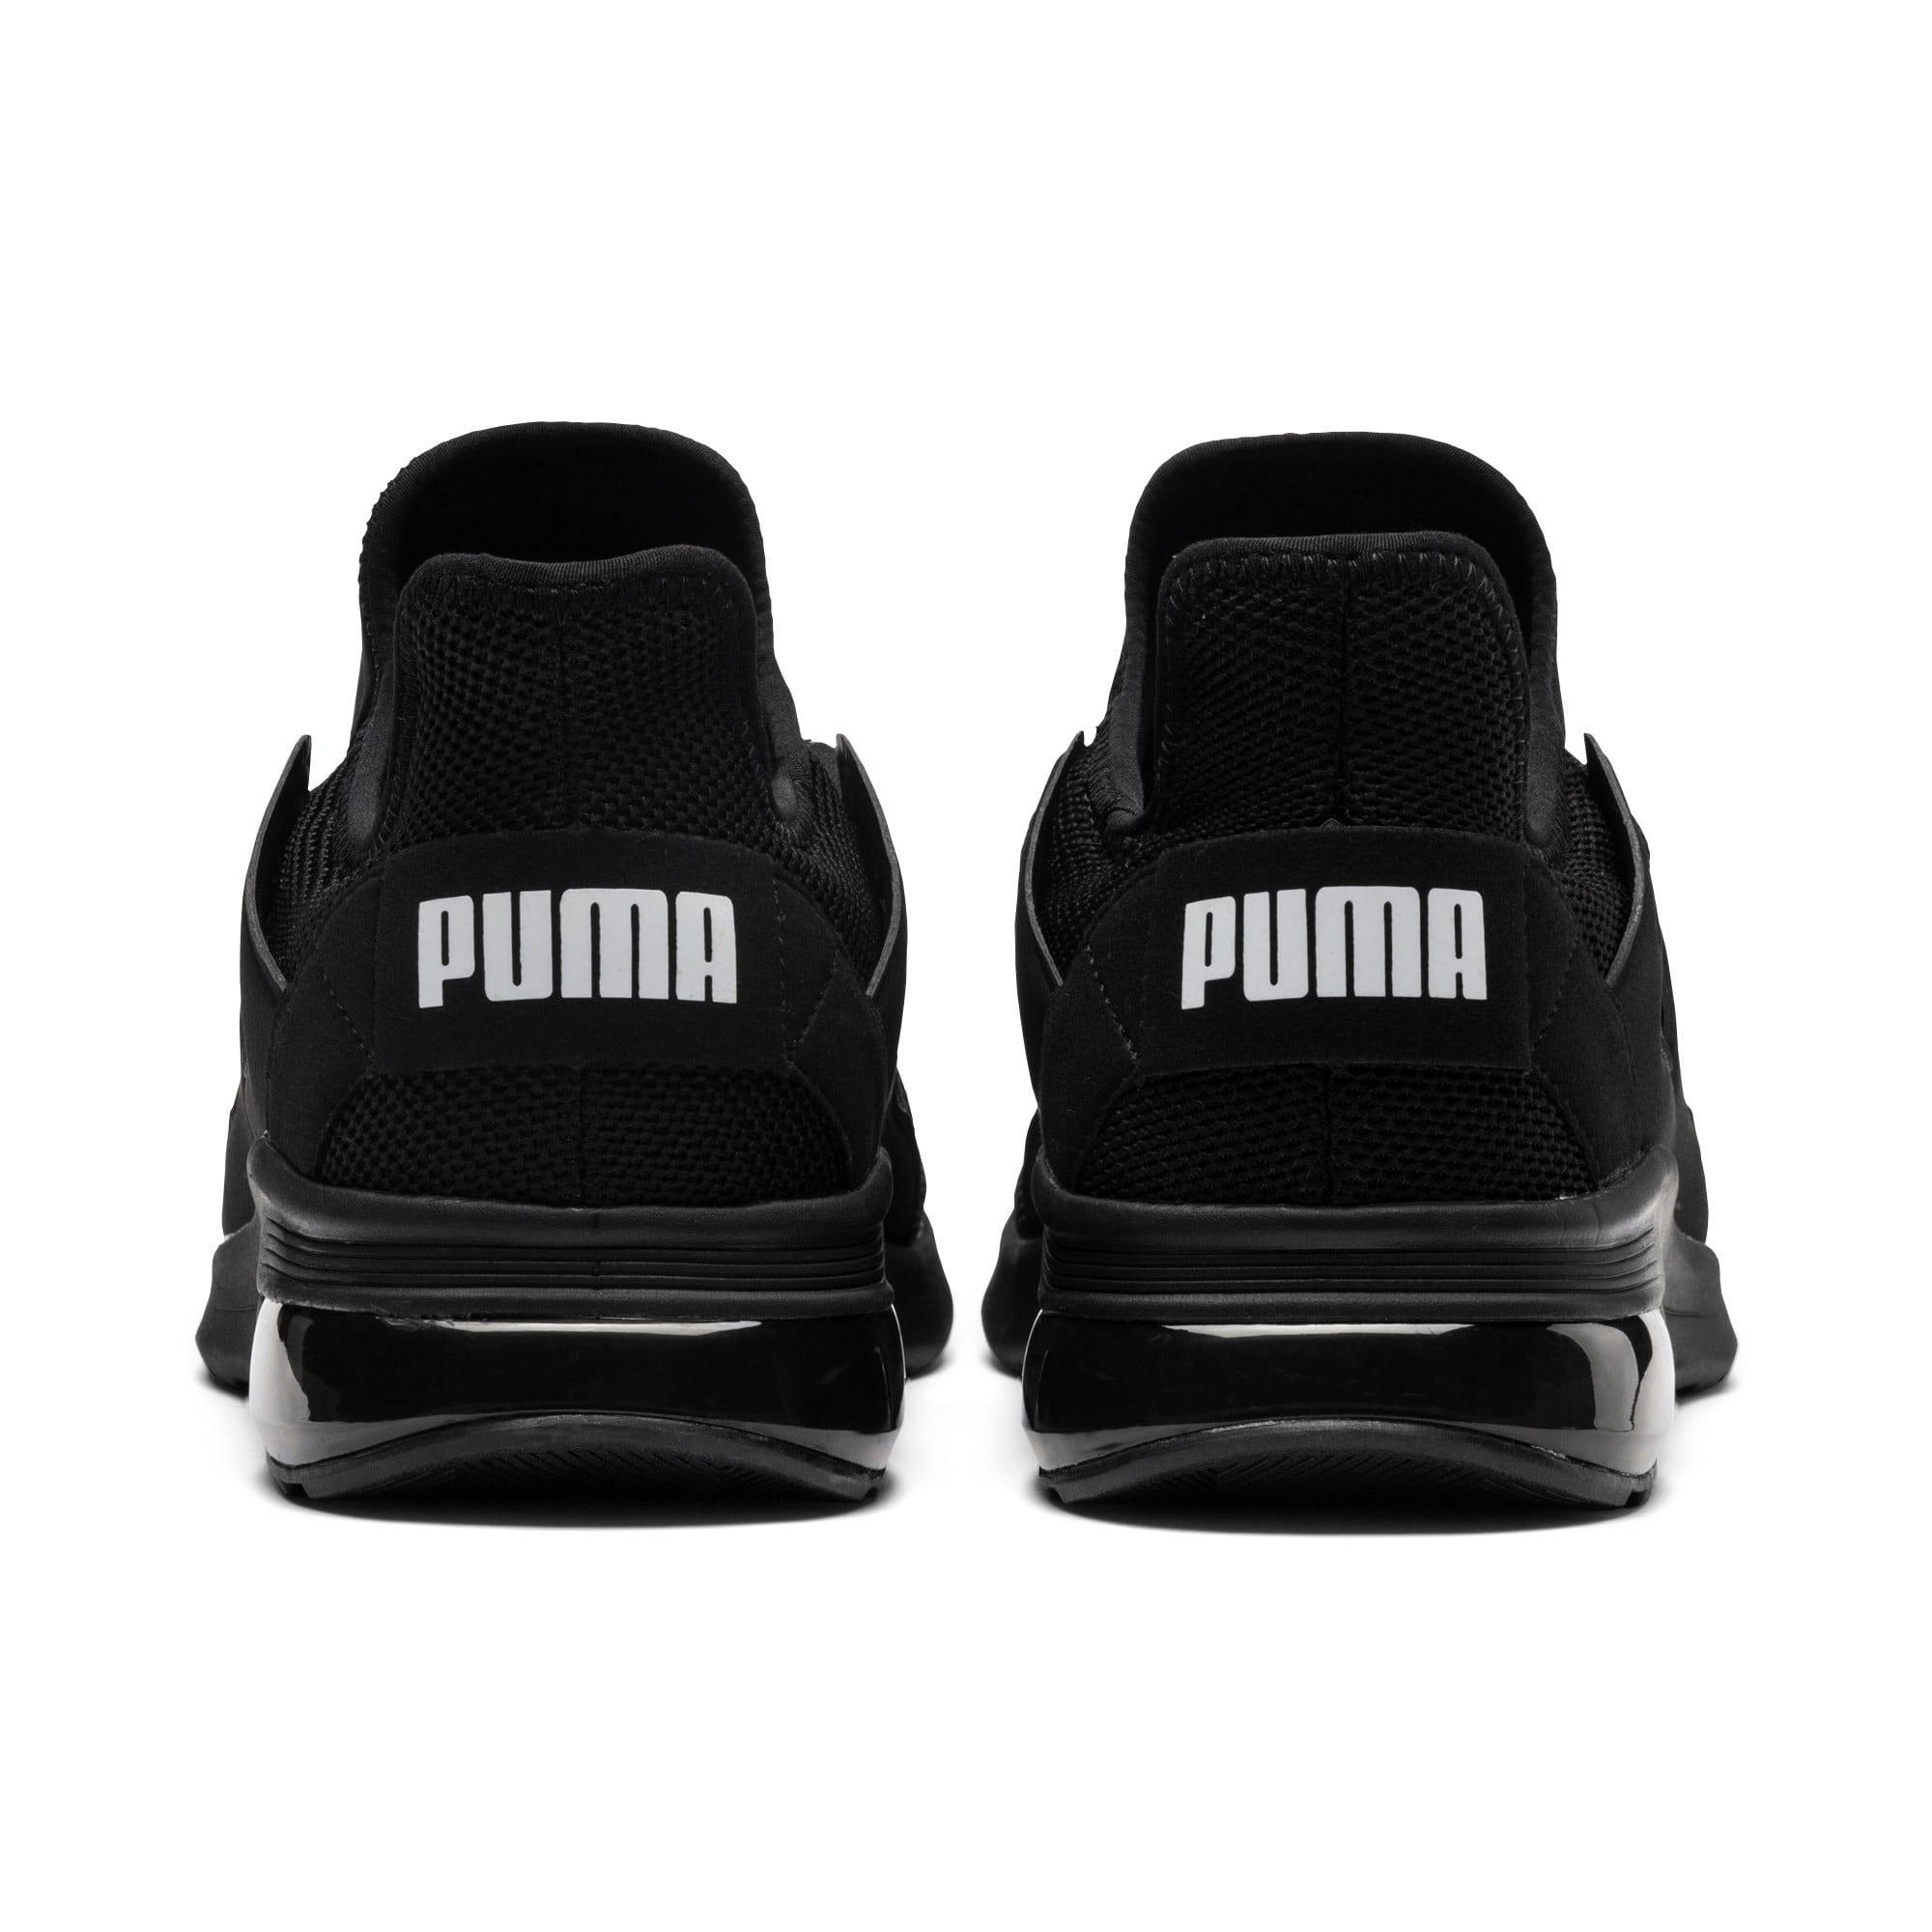 Thumbnail 4 of Electron Street Sneakers, Puma Black-Puma Black-Black, medium